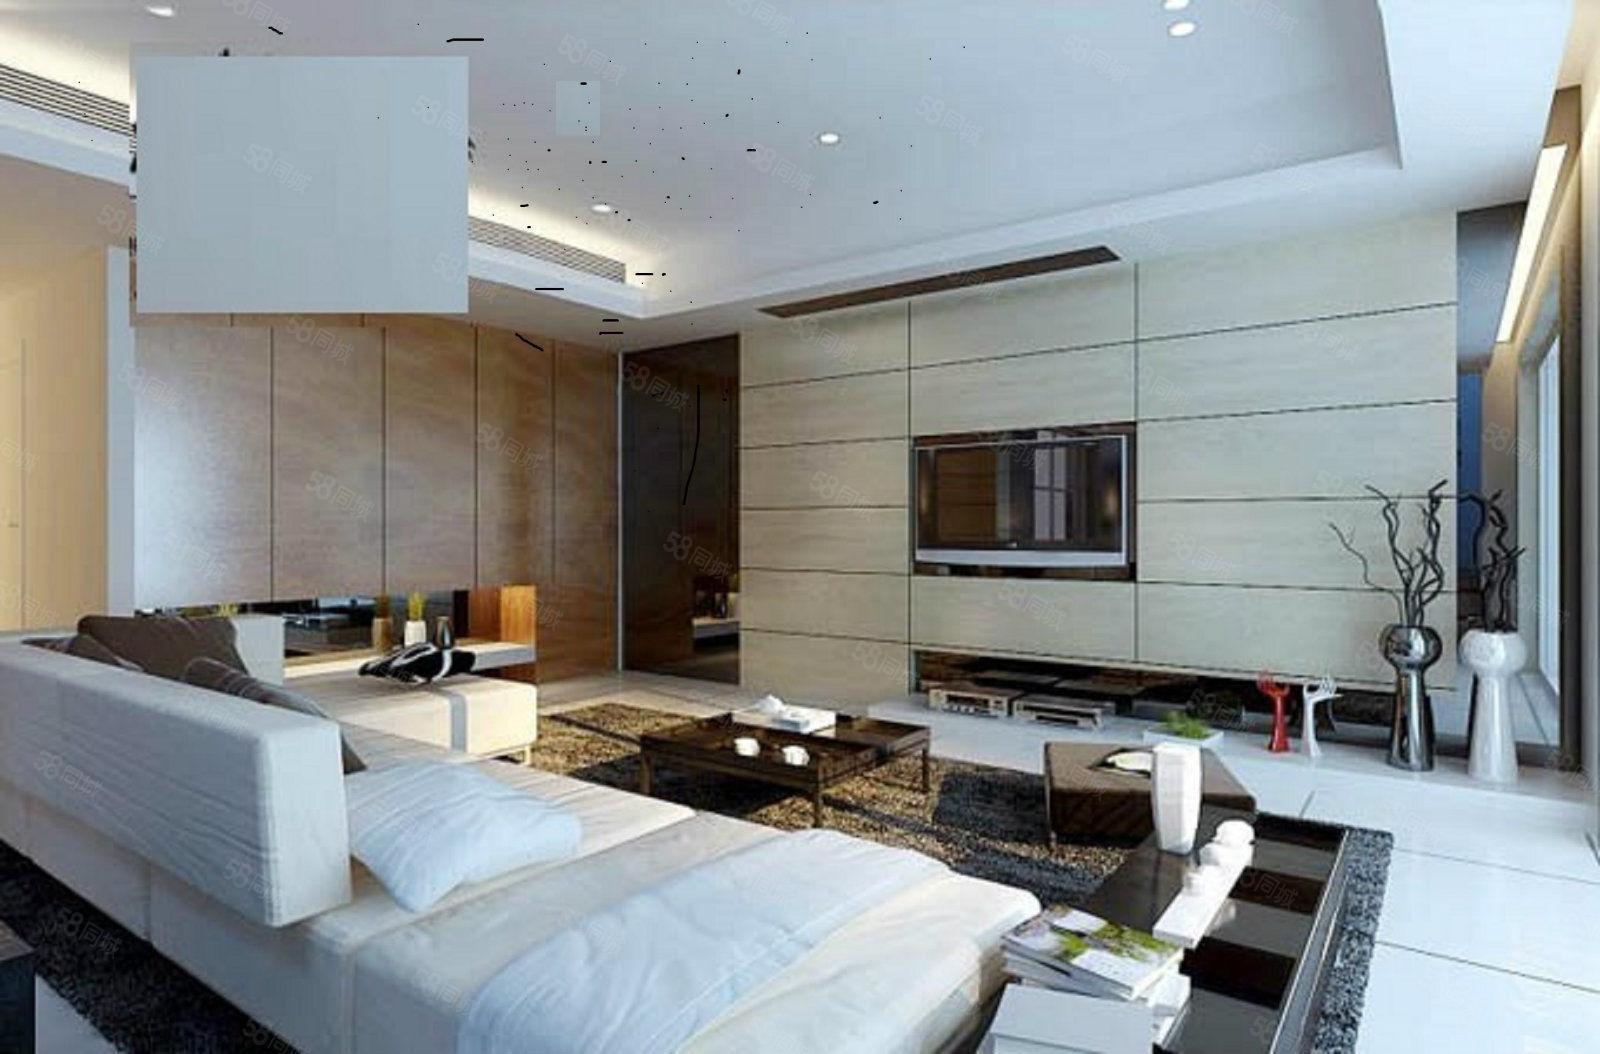 云�����H12��3室中�b家具空�{�R全年付15000元